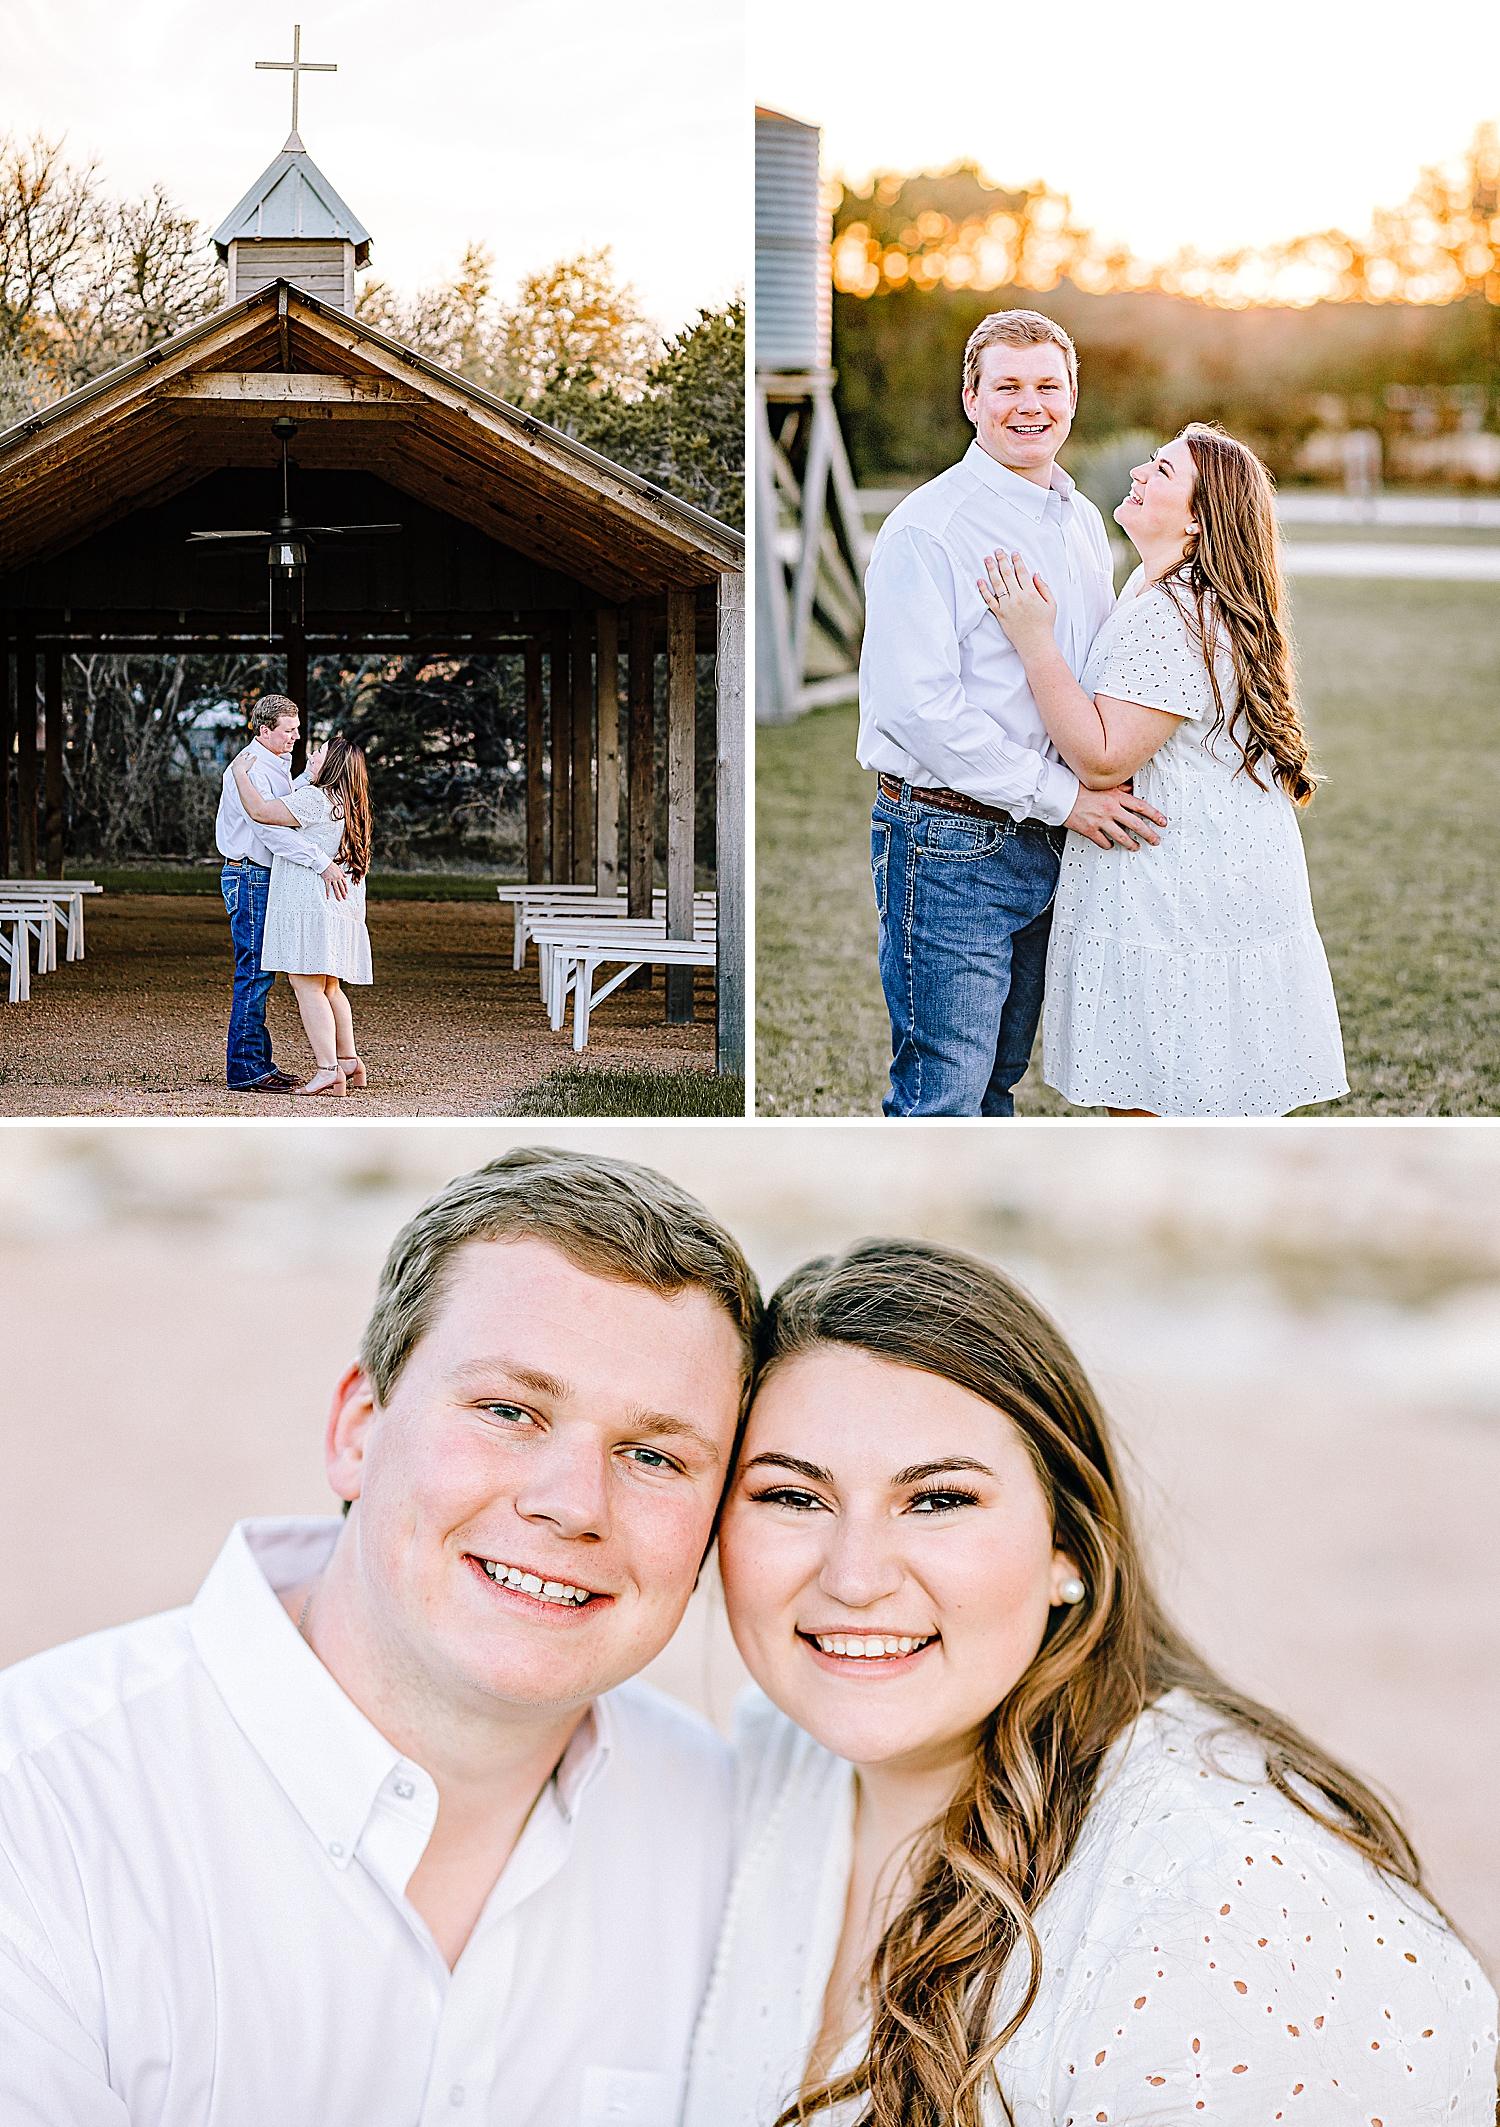 Engagement-photo-session-Western-Sky-wedding-venue-bulverde-texas-carly-barton-photography_0017.jpg